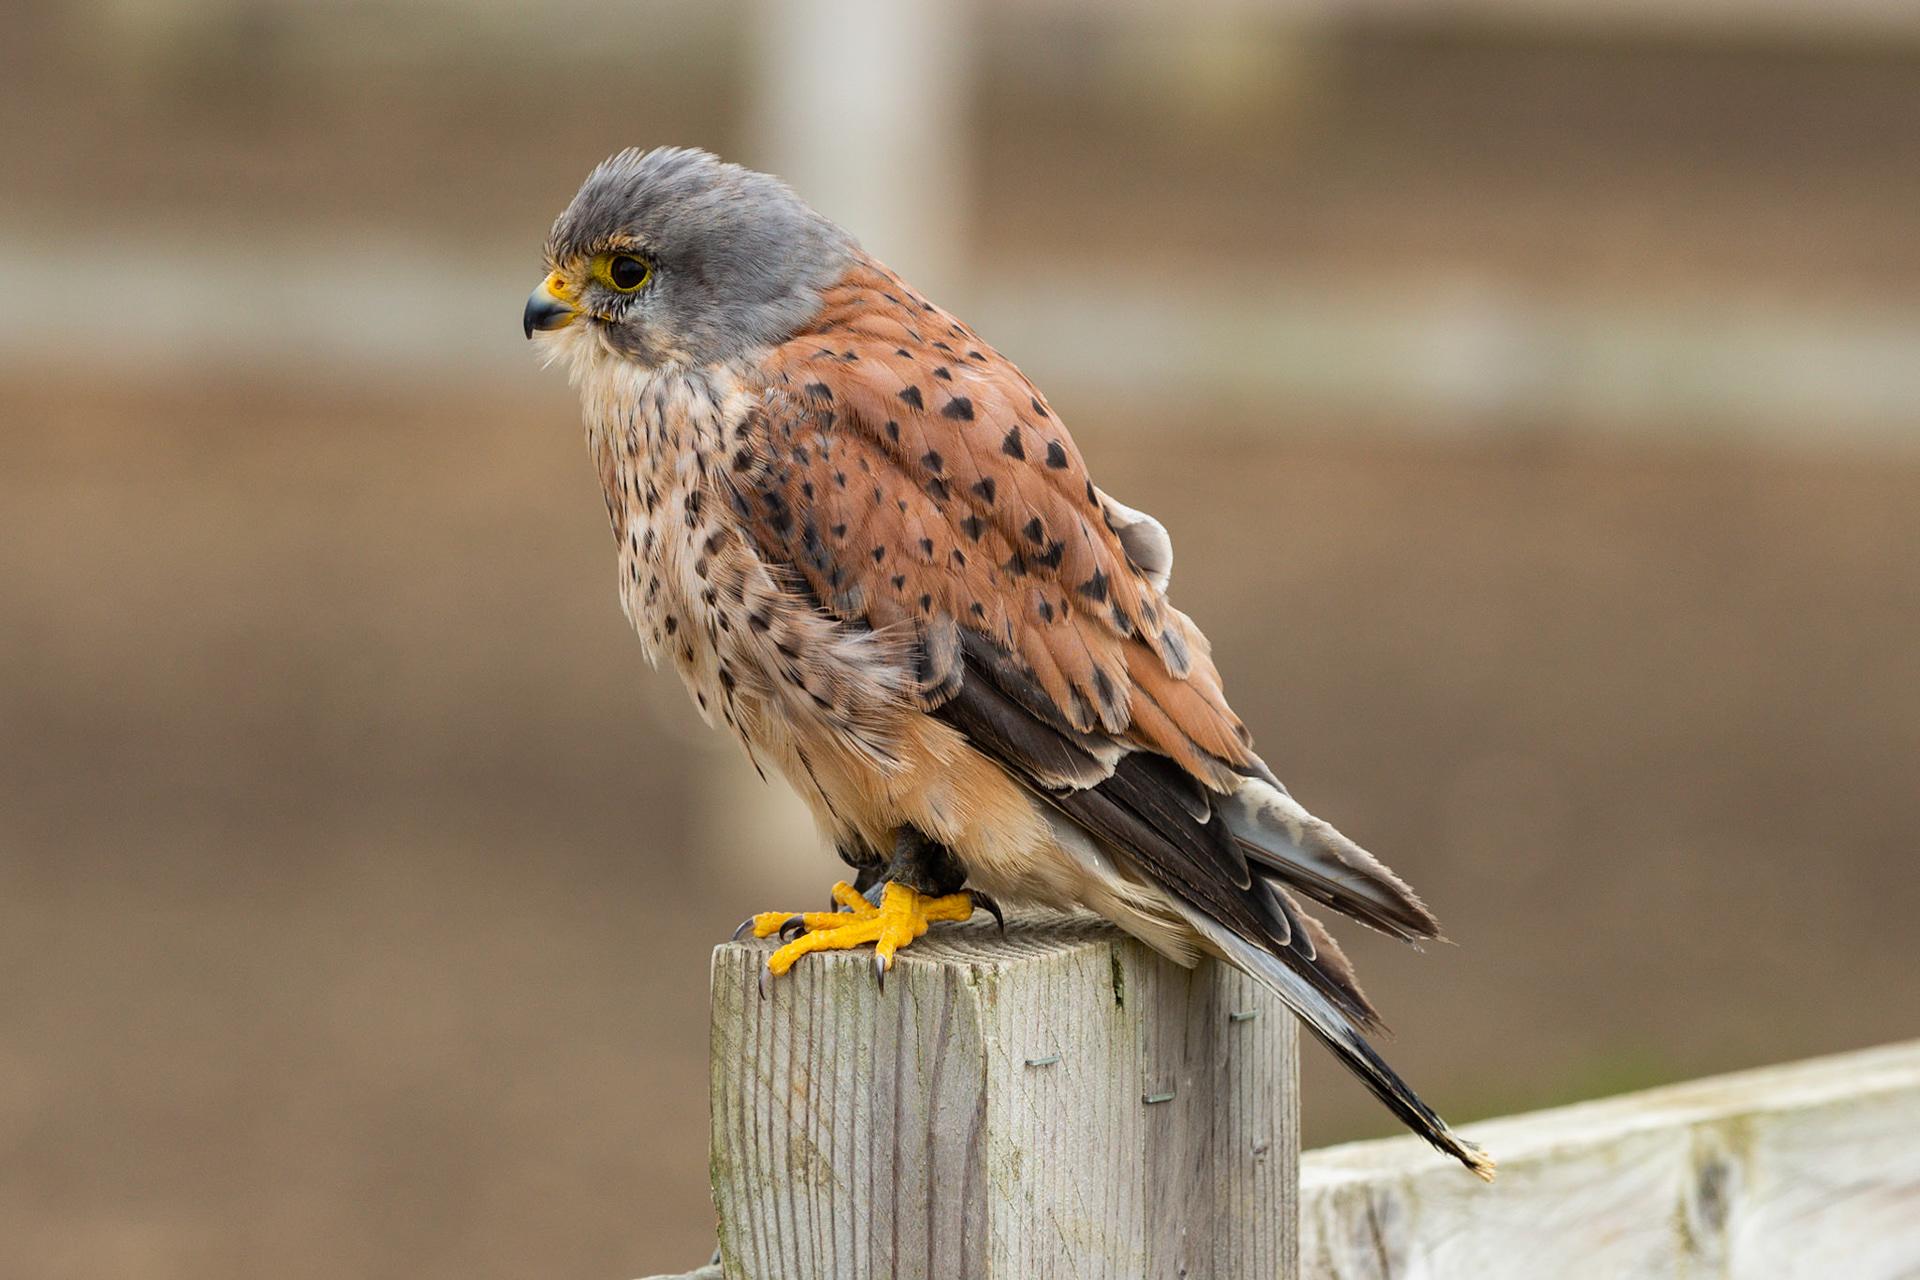 english school of falconry